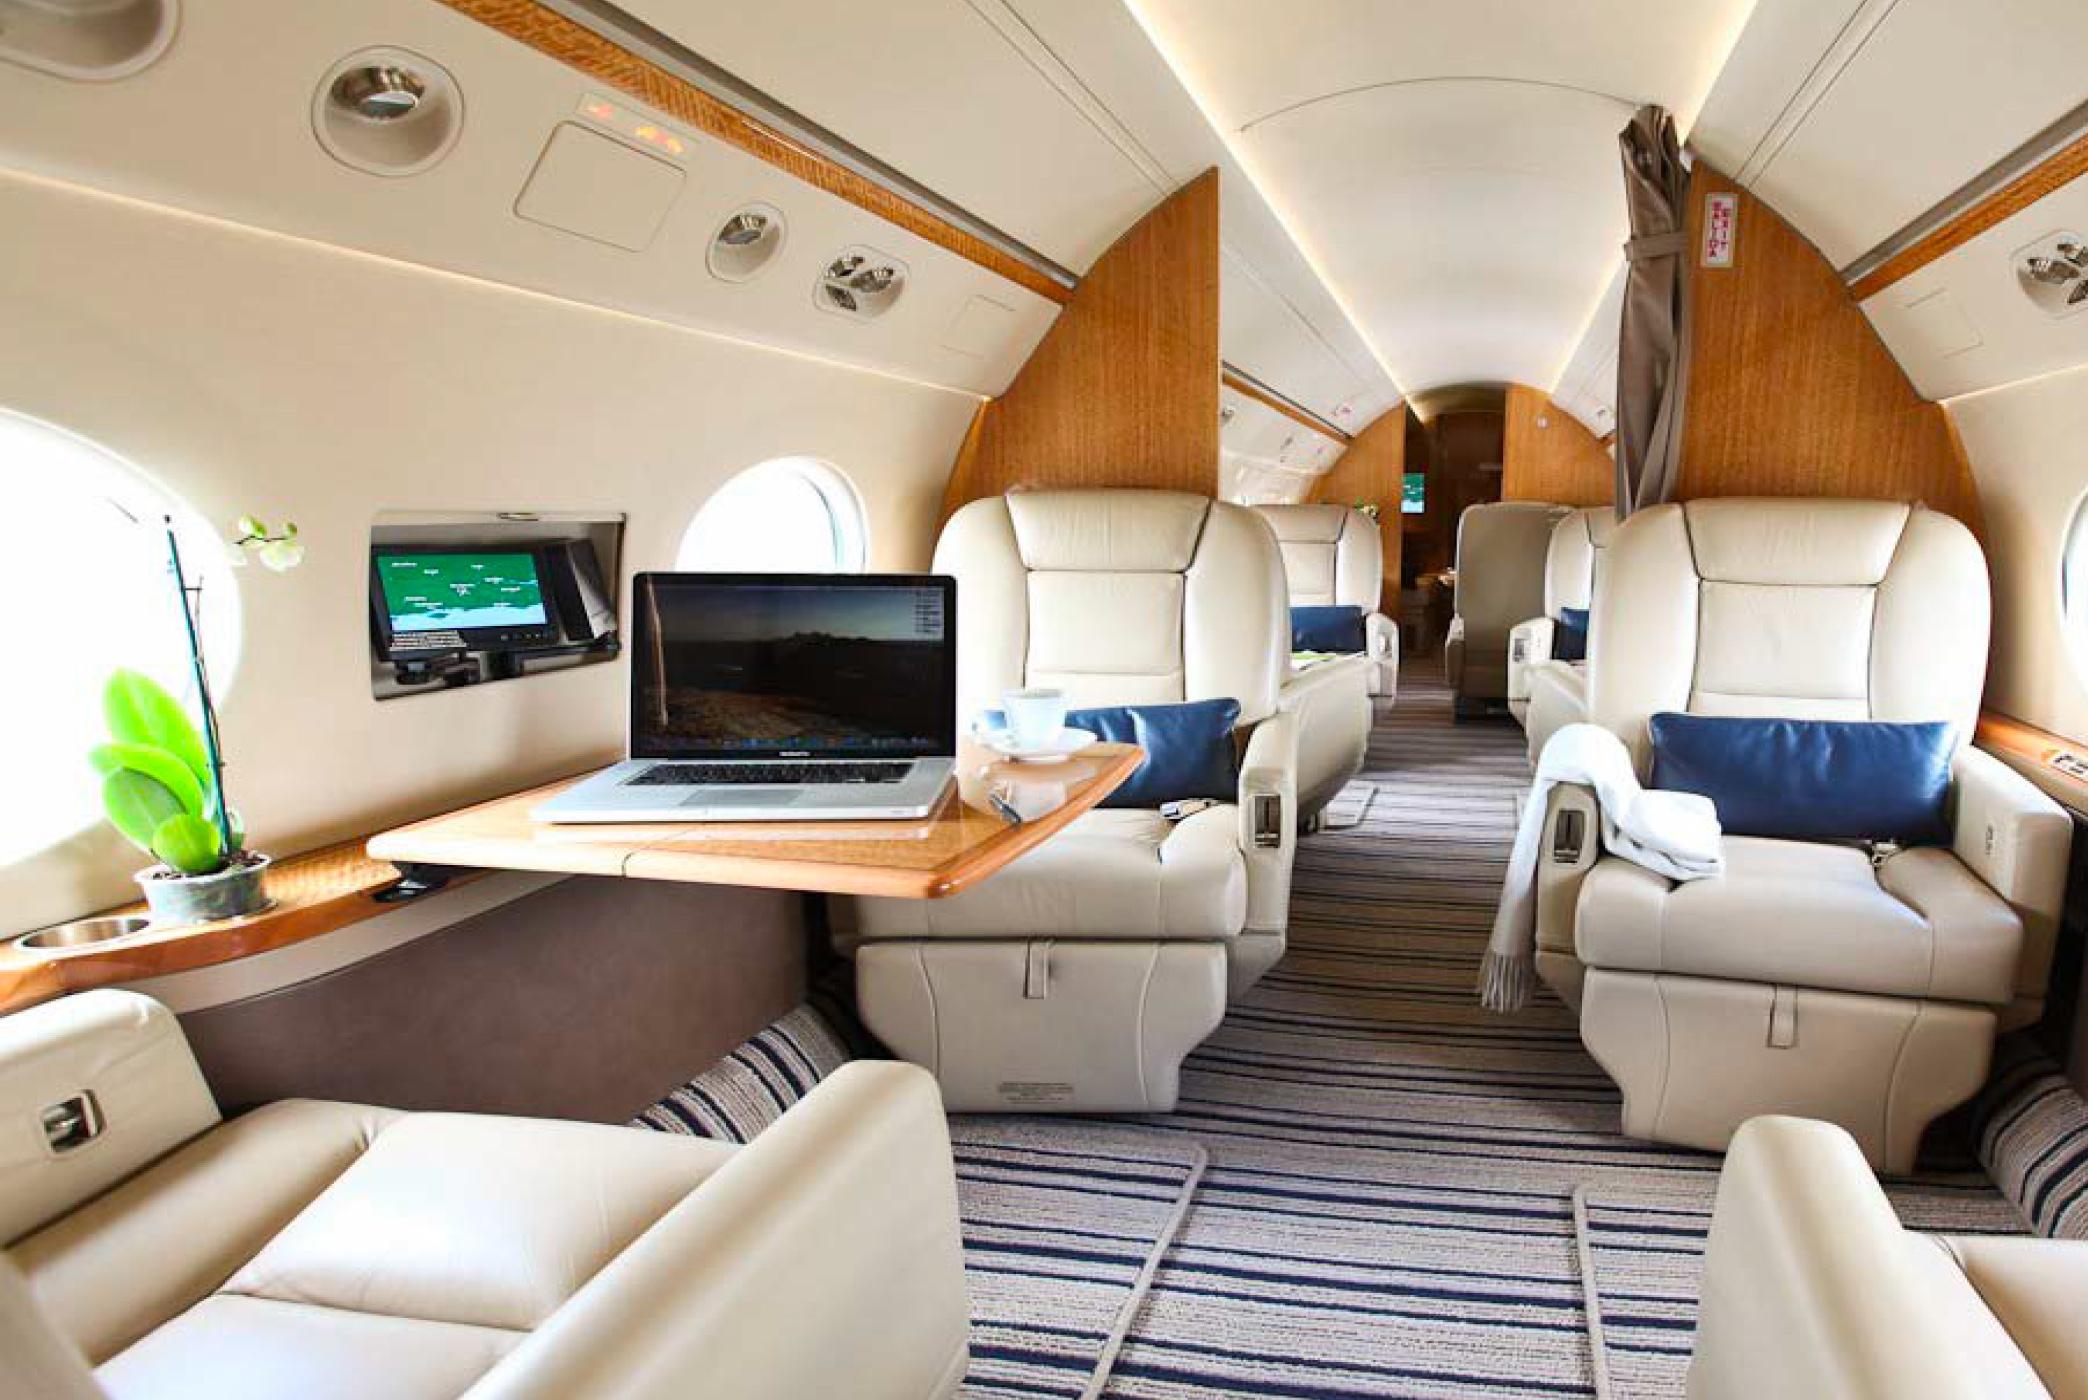 2007 Gulfstream G550 S/N 5151